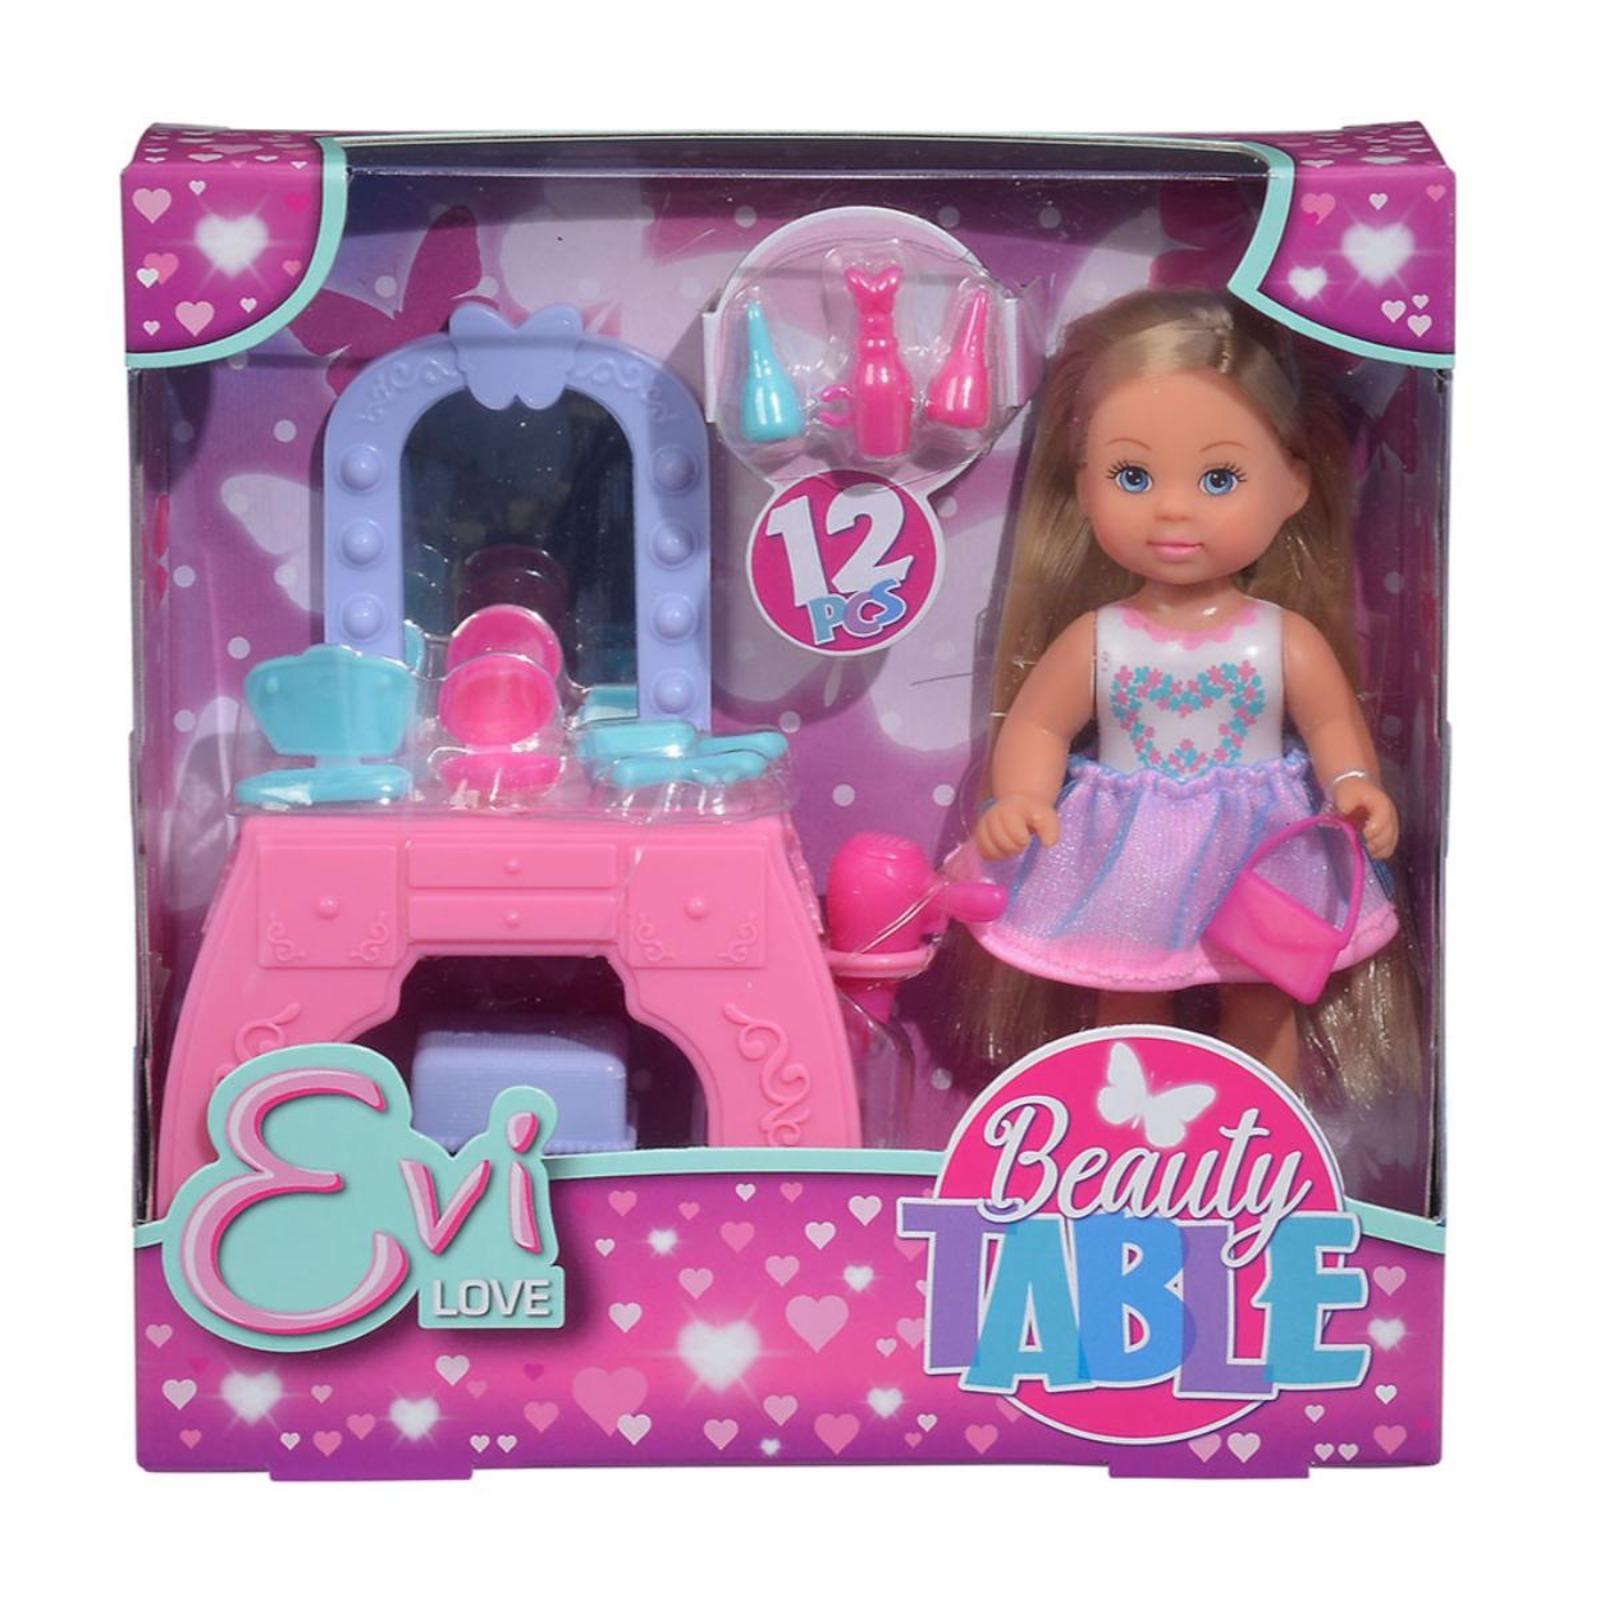 Simba Toys Evi LOVE Beauty Table